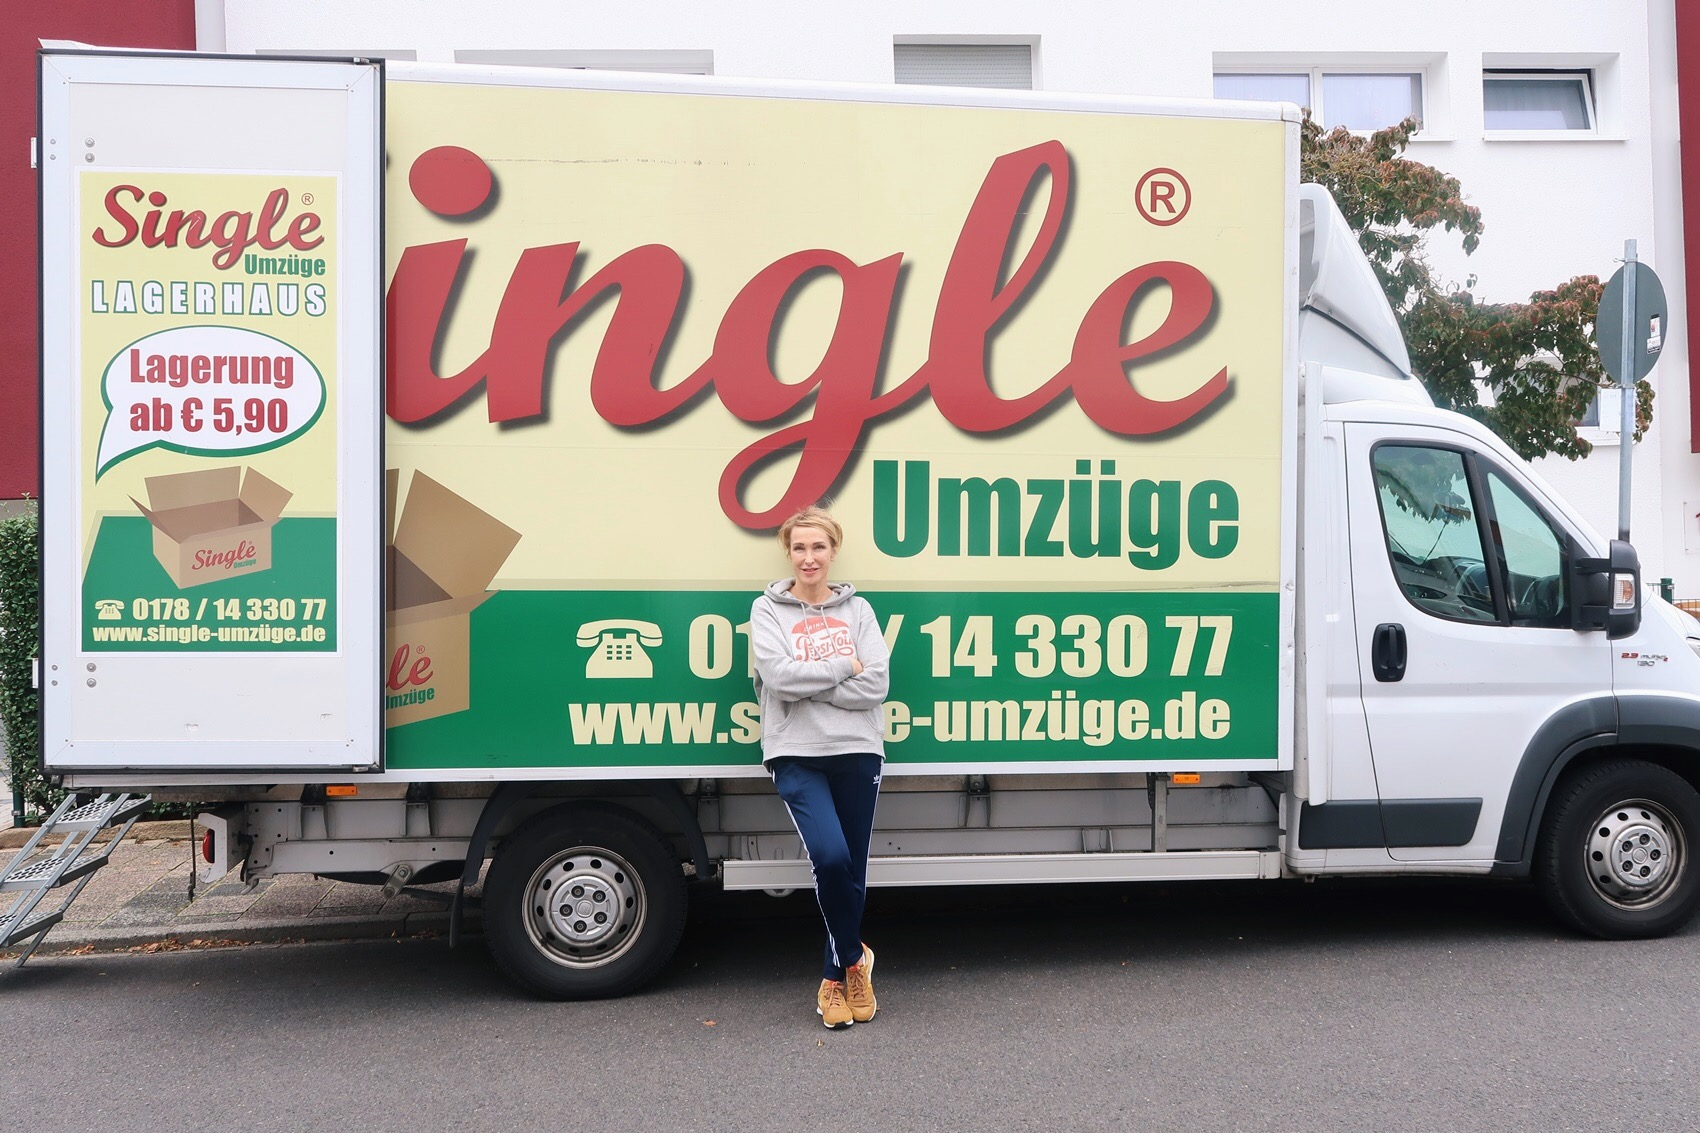 glamupyourlifestyle single-umzüge Umzug neue Wohnung Umzugsunternehmen möbel-abbauen ü-40-blog ue-50-blog singl